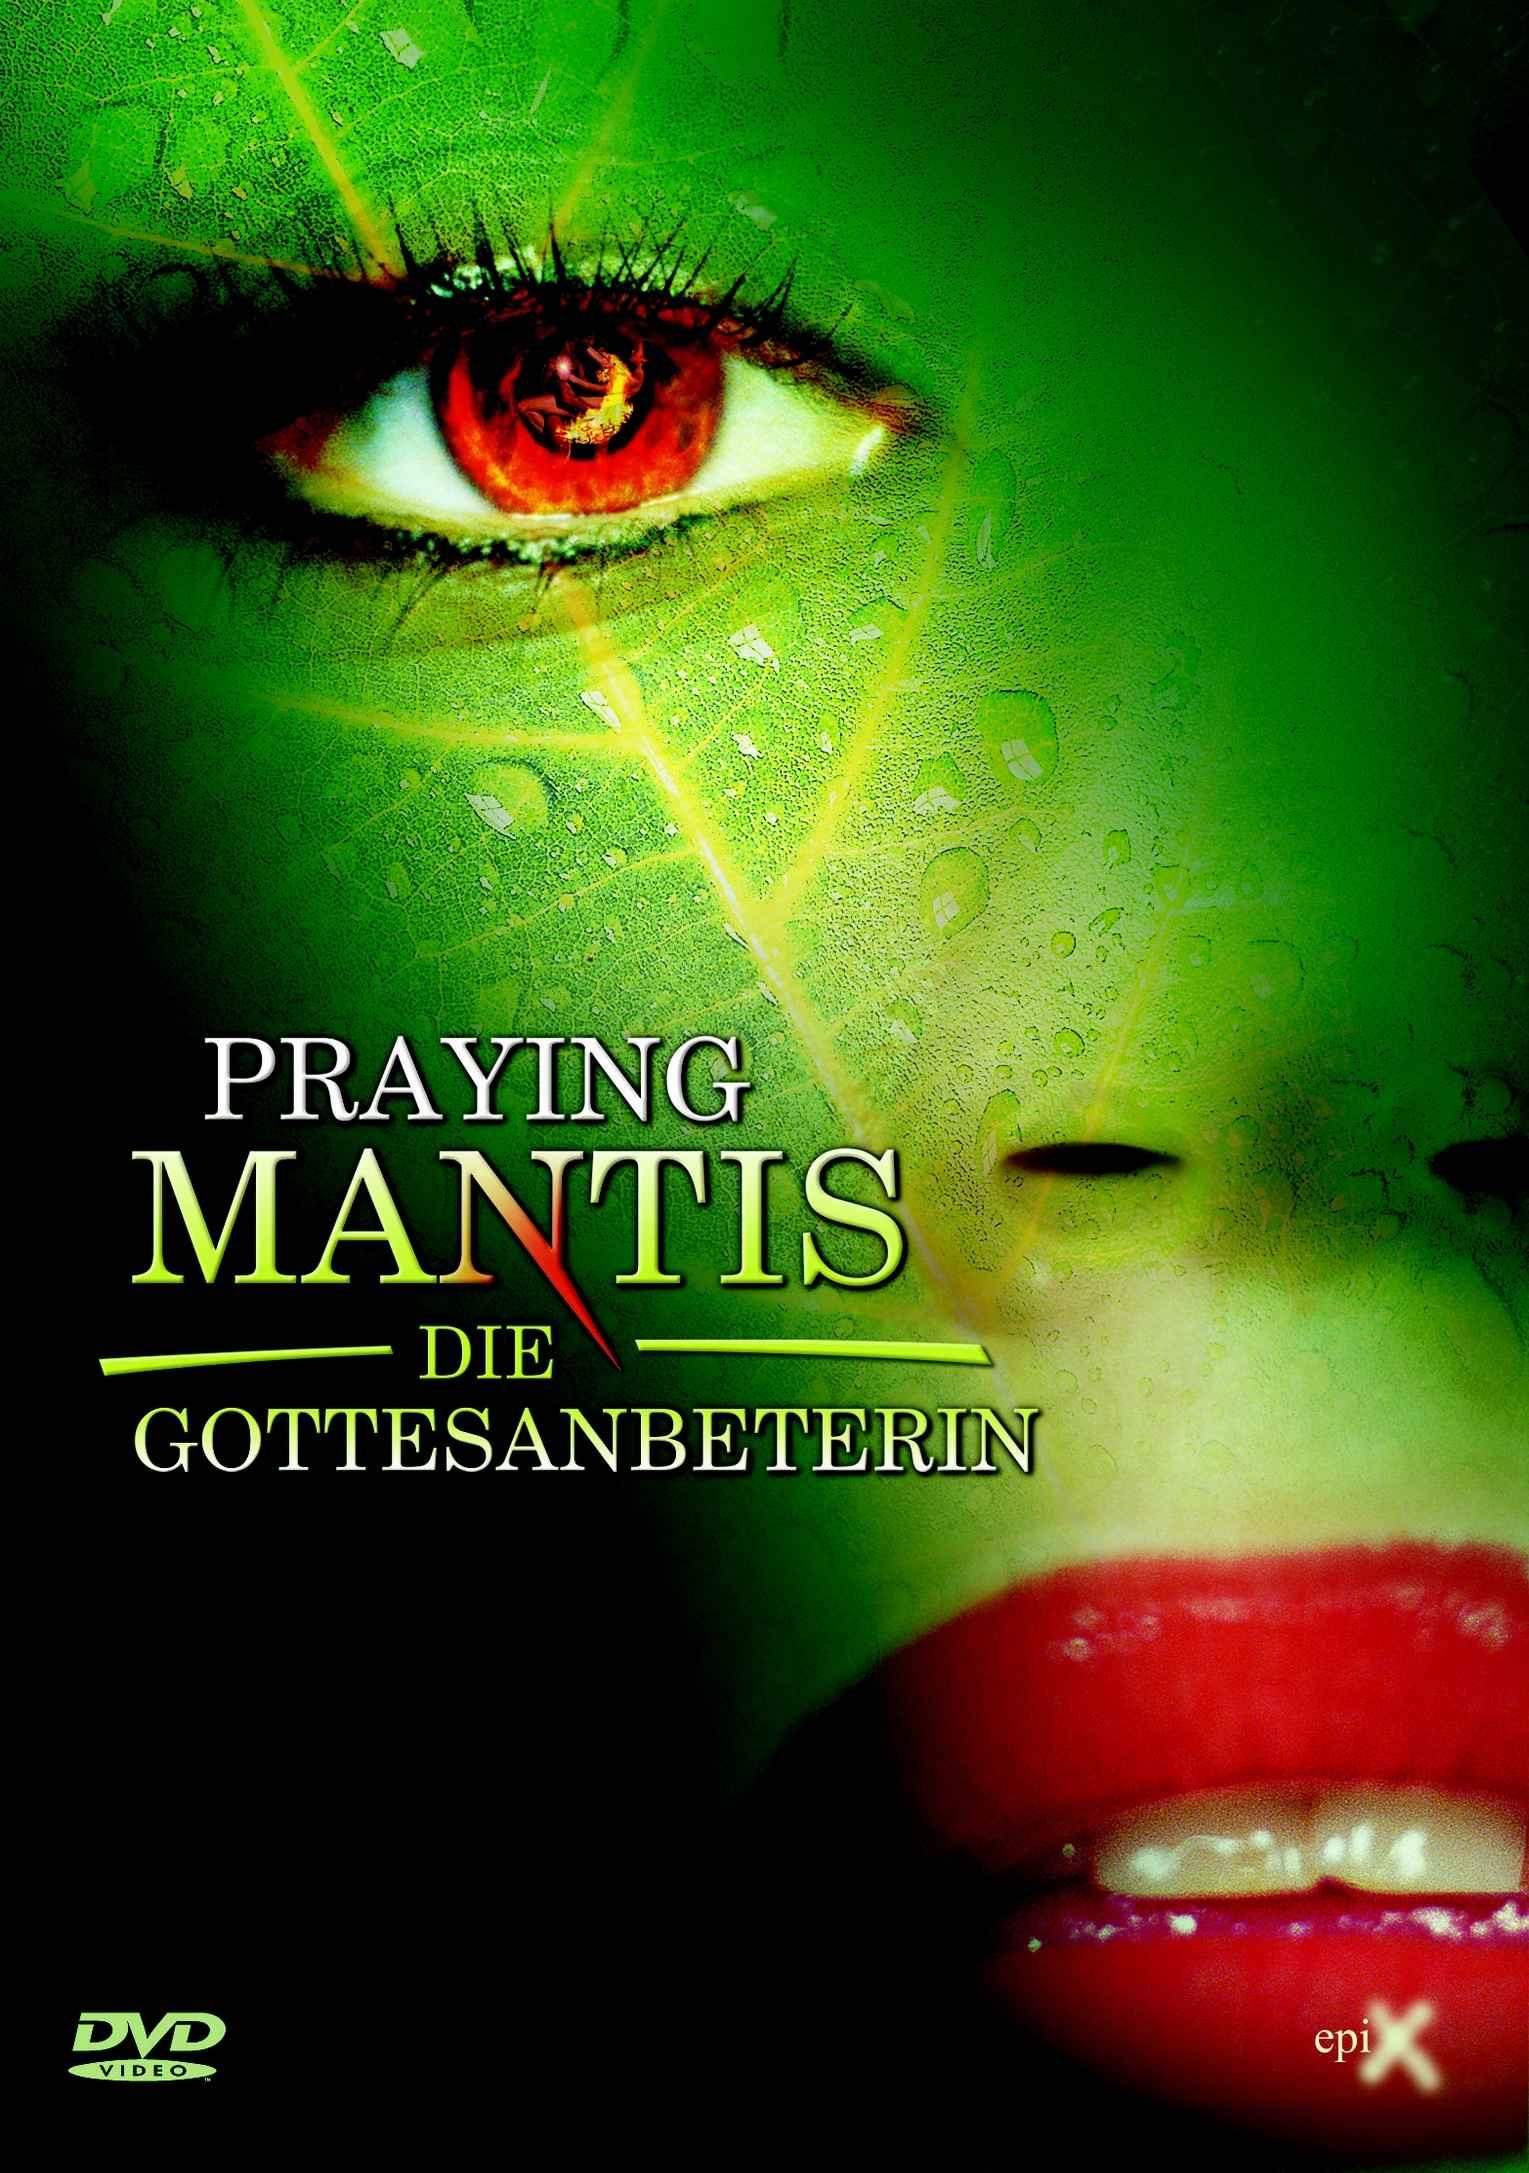 PRAYING MANTIS Frontcover FINAL